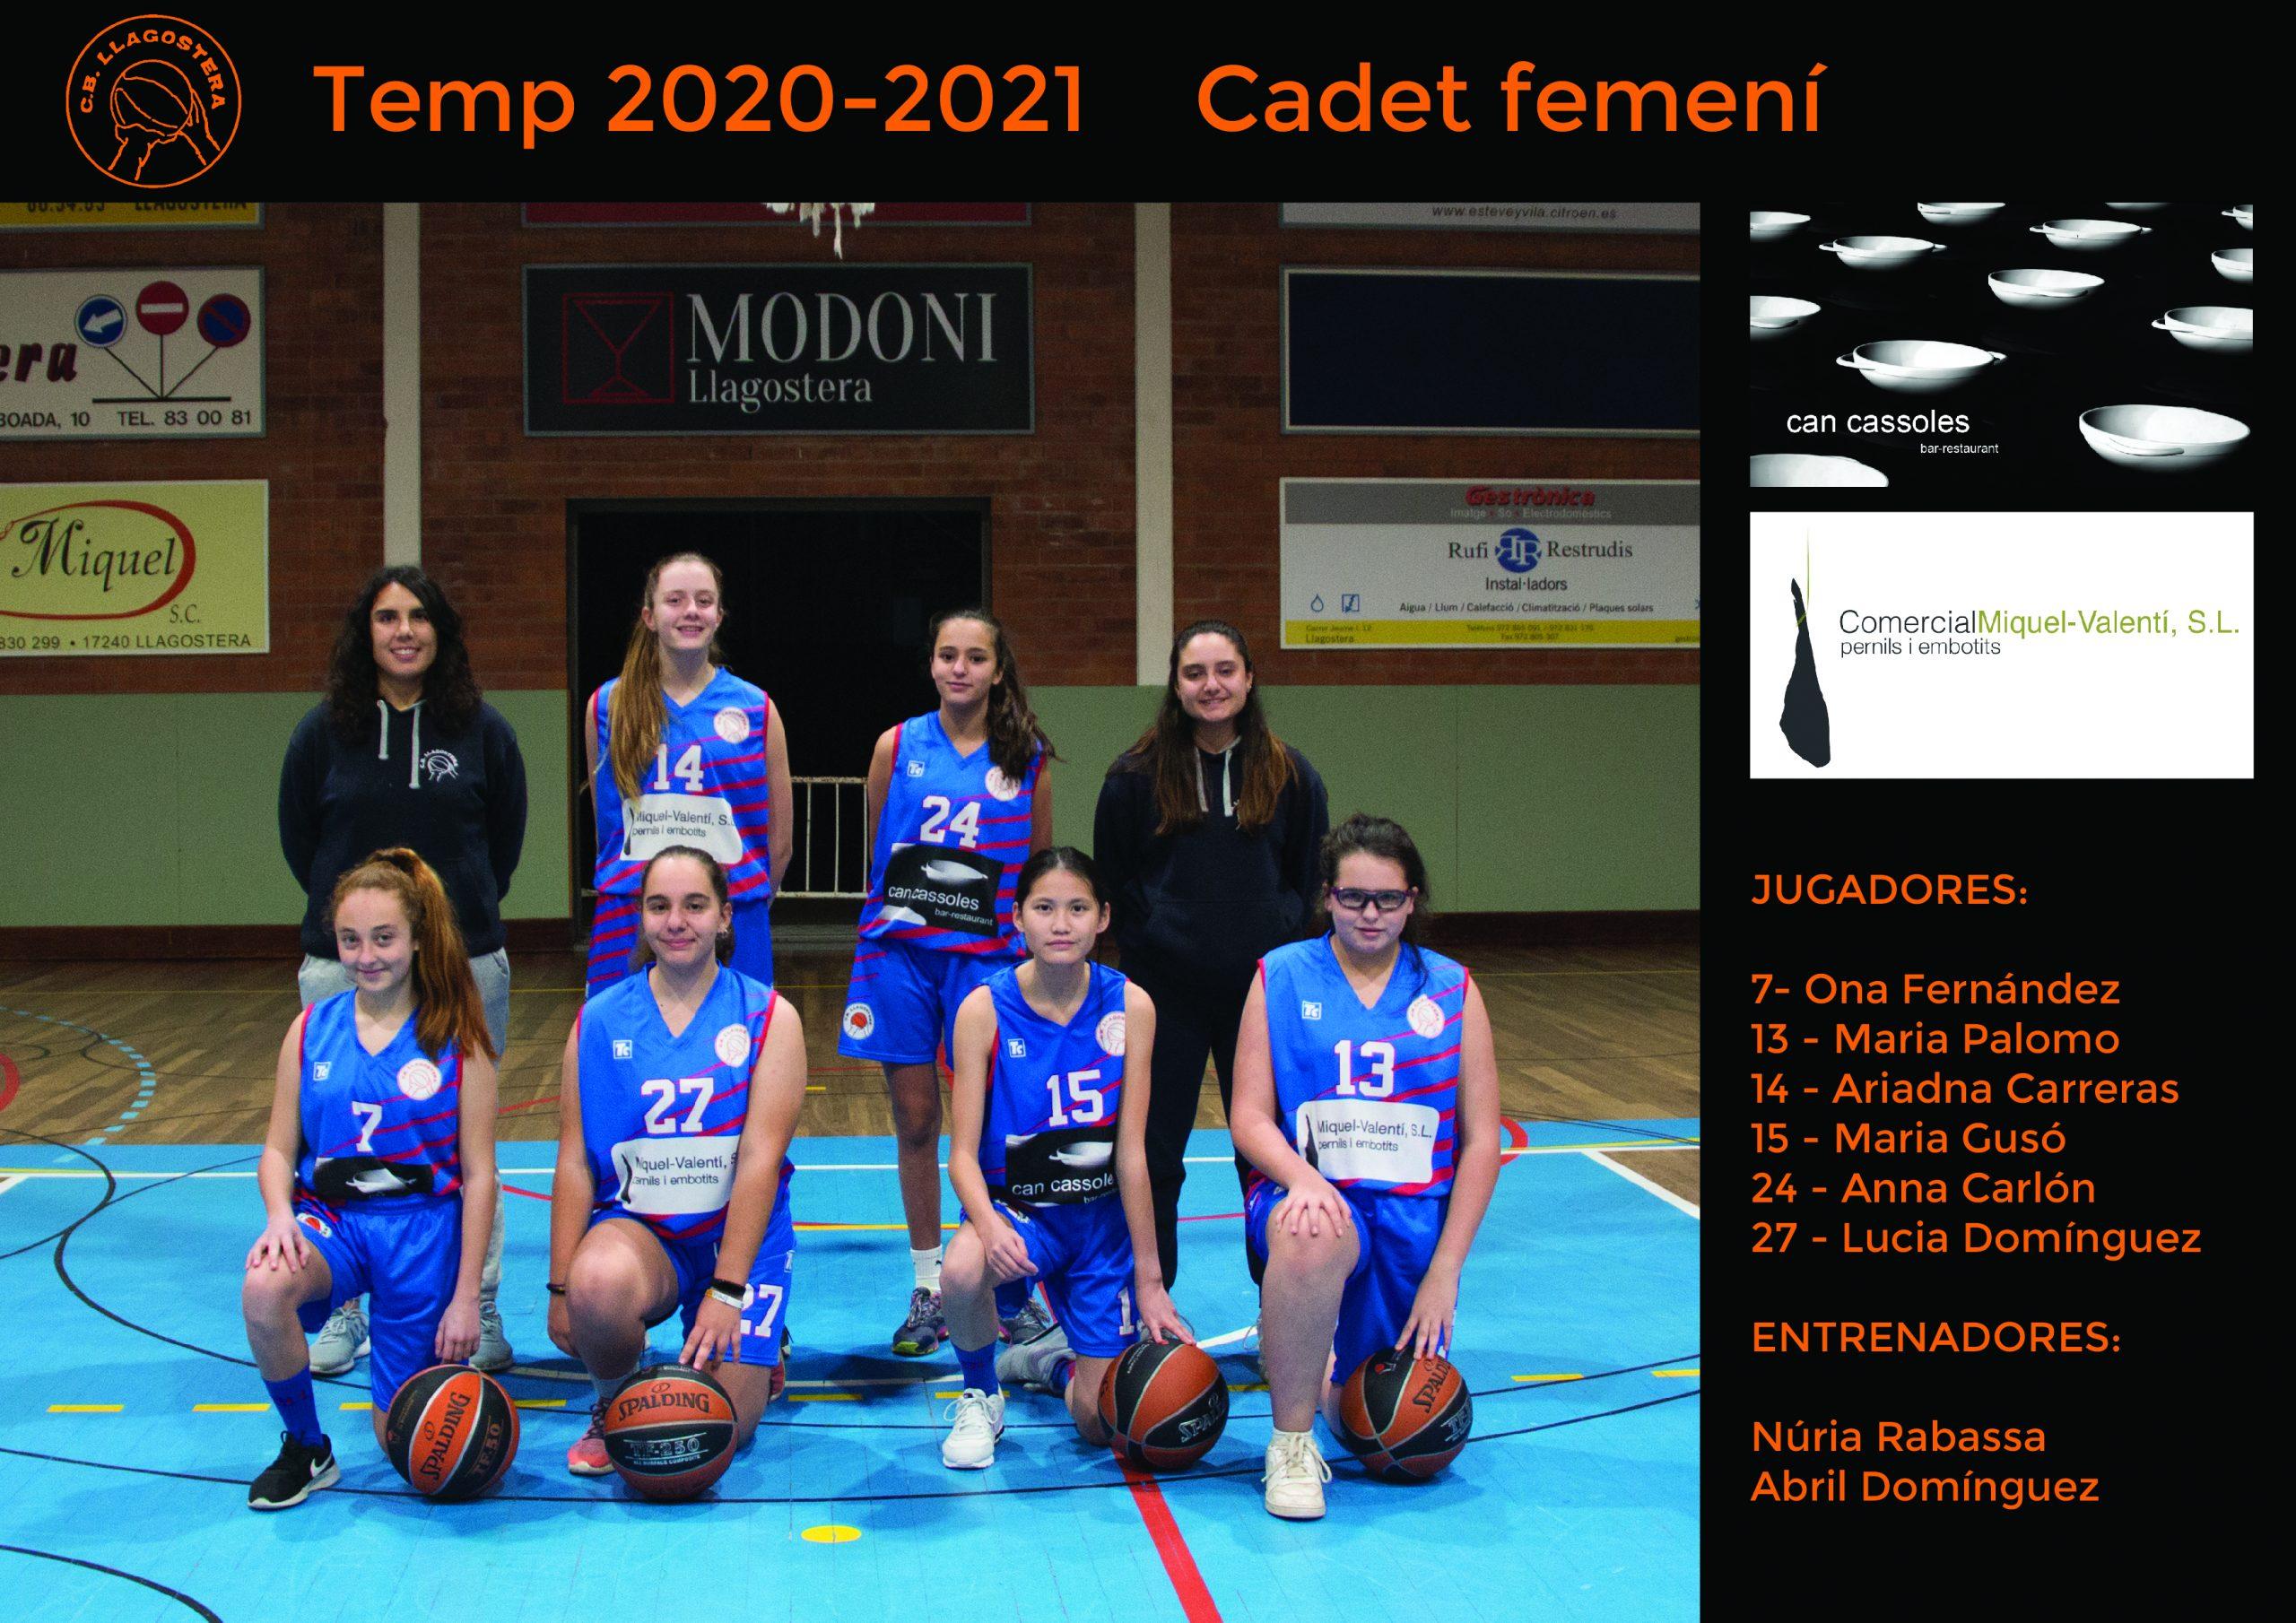 http://www.cbllagostera.com/wp-content/uploads/2021/04/CadetFemeni_A4-01-scaled.jpg